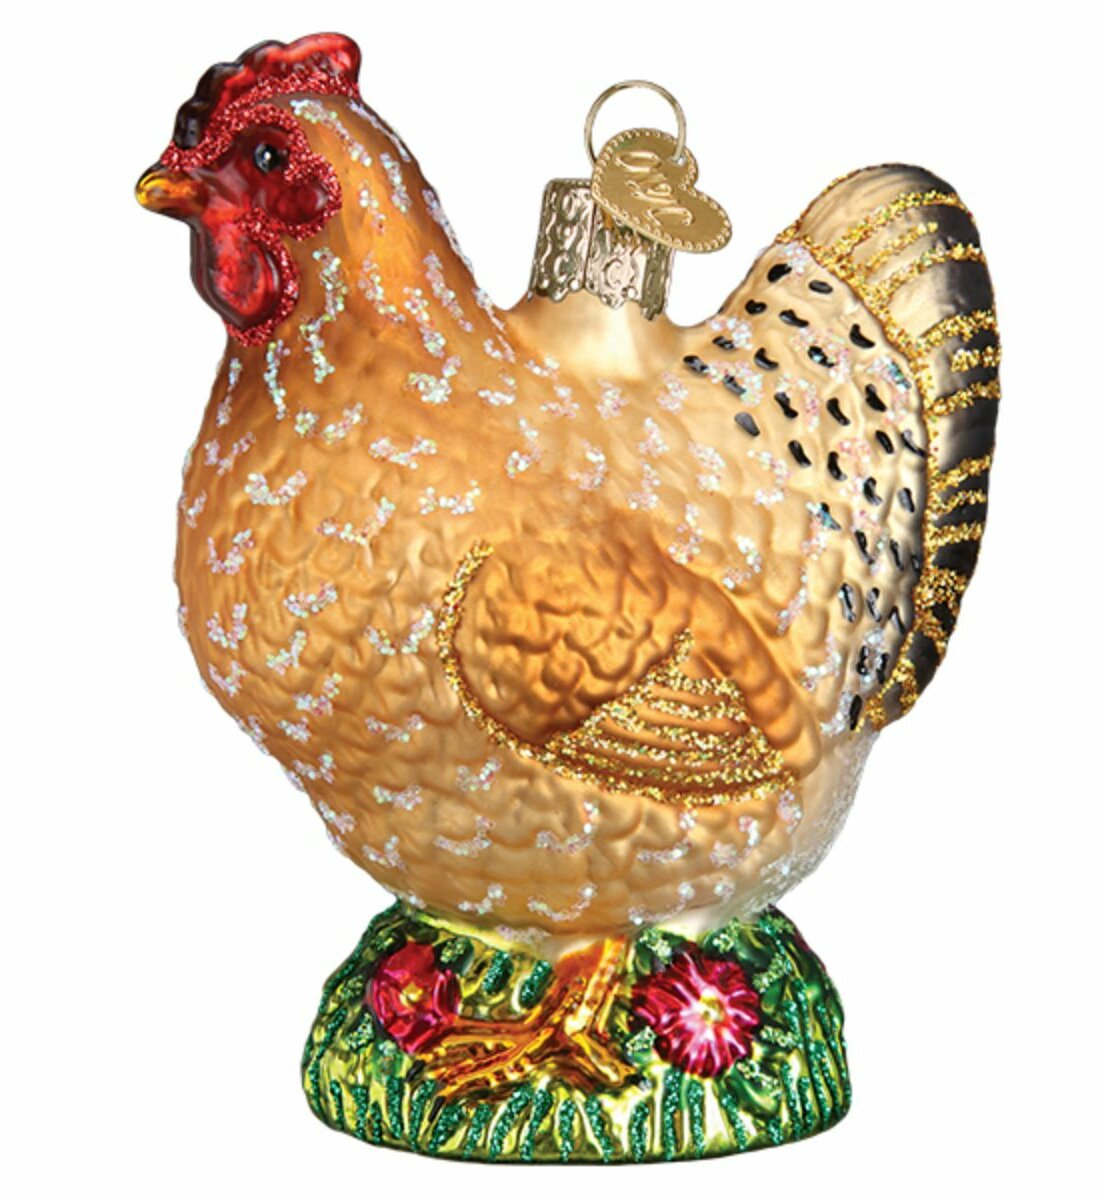 Old World Christmas Spring Chicken Hanging Figurine Ornament Reviews Wayfair